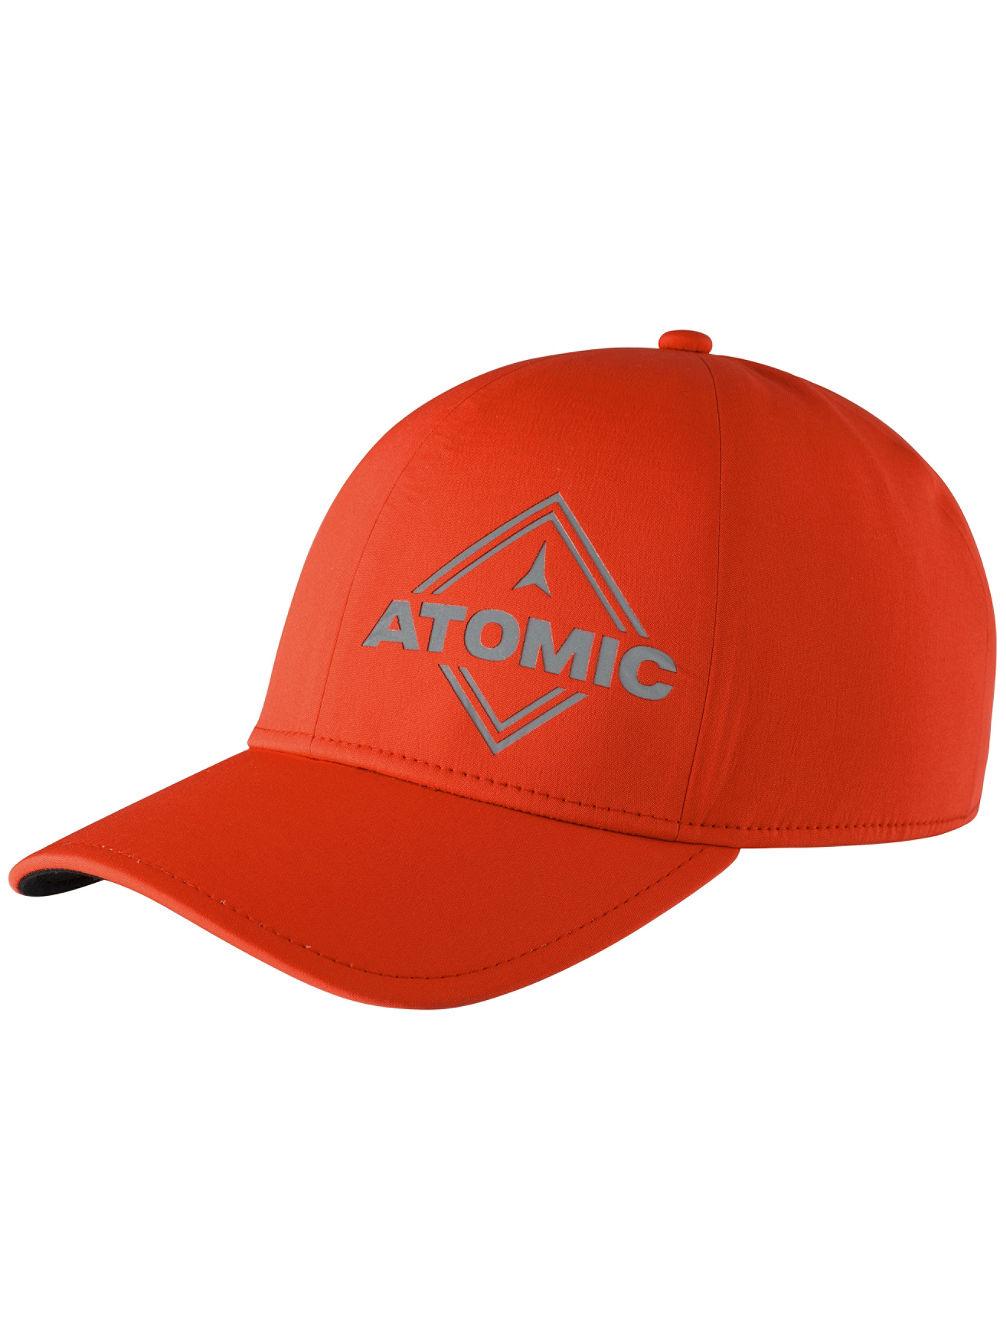 c1d4f6dfe43 Buy Atomic Alps Tech Cap online at Blue Tomato